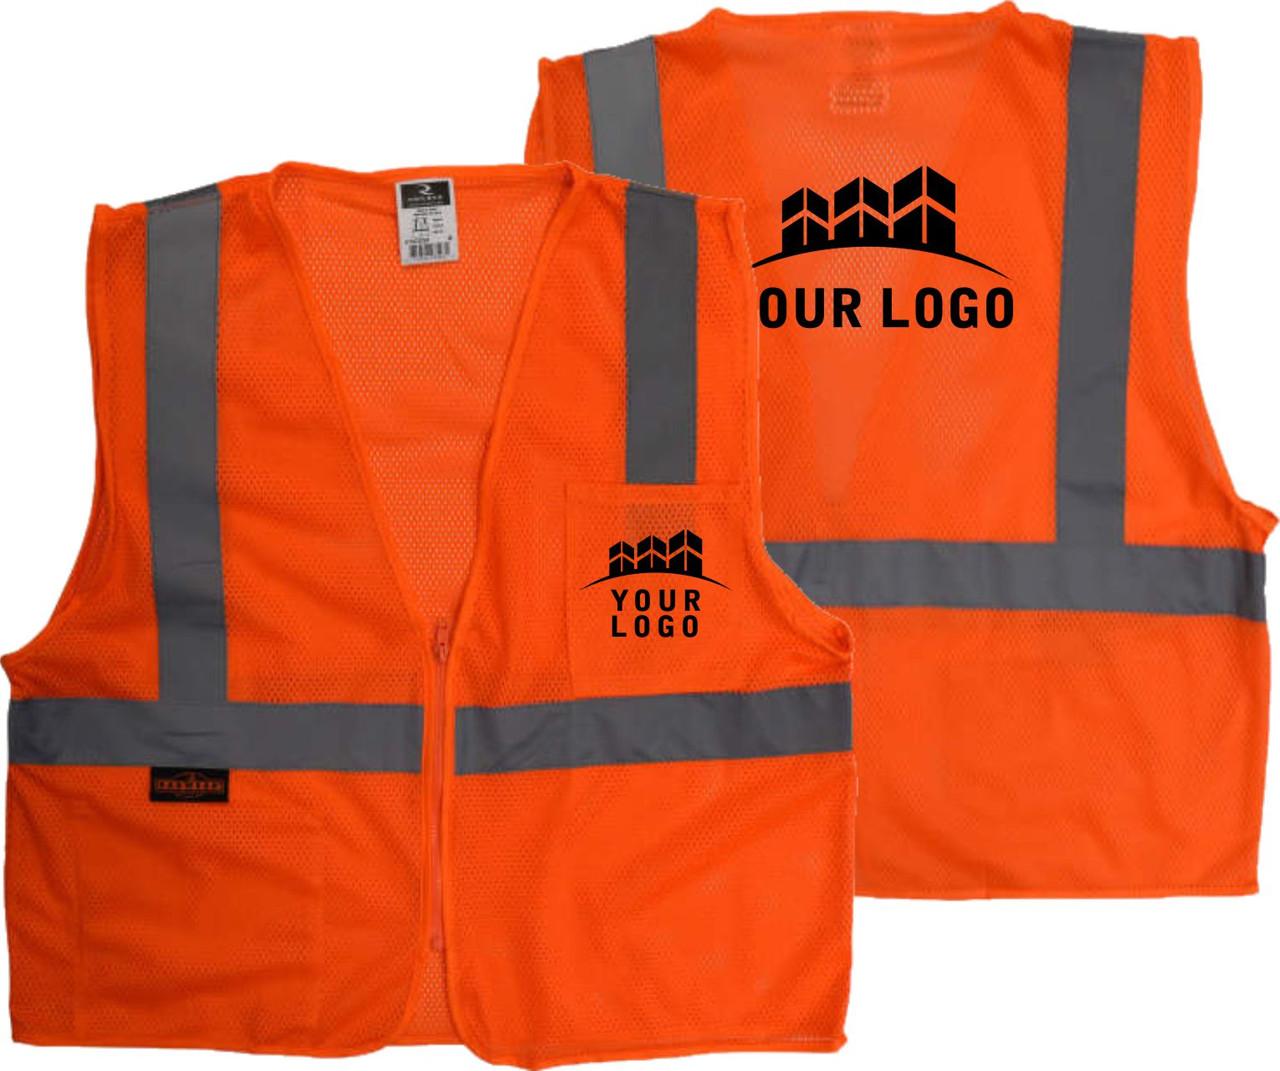 Custom Printed Safety Vest   Safety Vest with Logo   Class 2 Safety Vest with Custom Logo